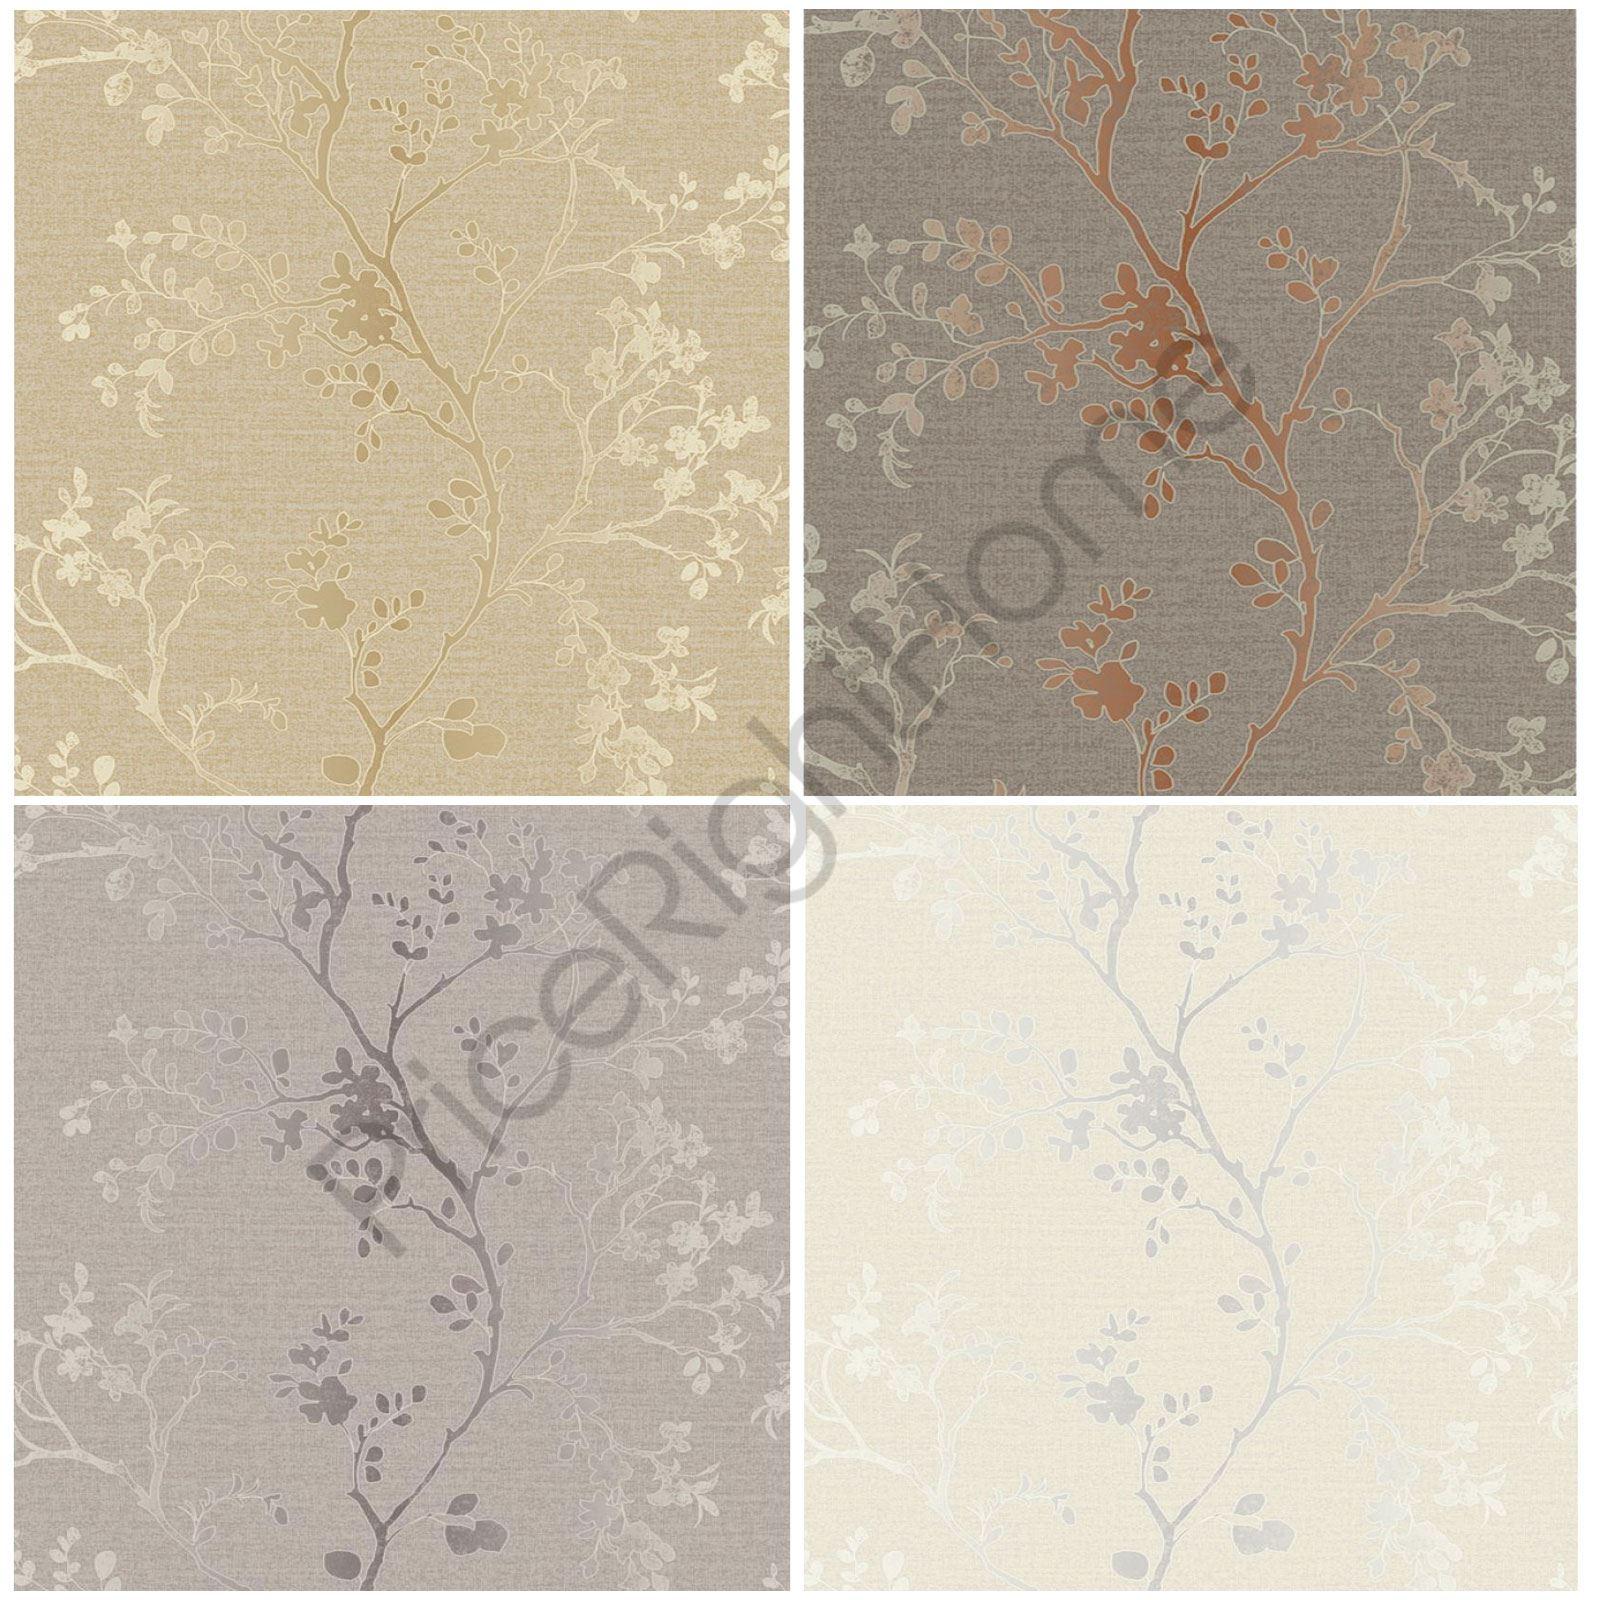 Top Wallpaper Harry Potter Rose Gold - b720be2e-885d-4dd9-9723-9f101dc3c954  2018_756135.jpg